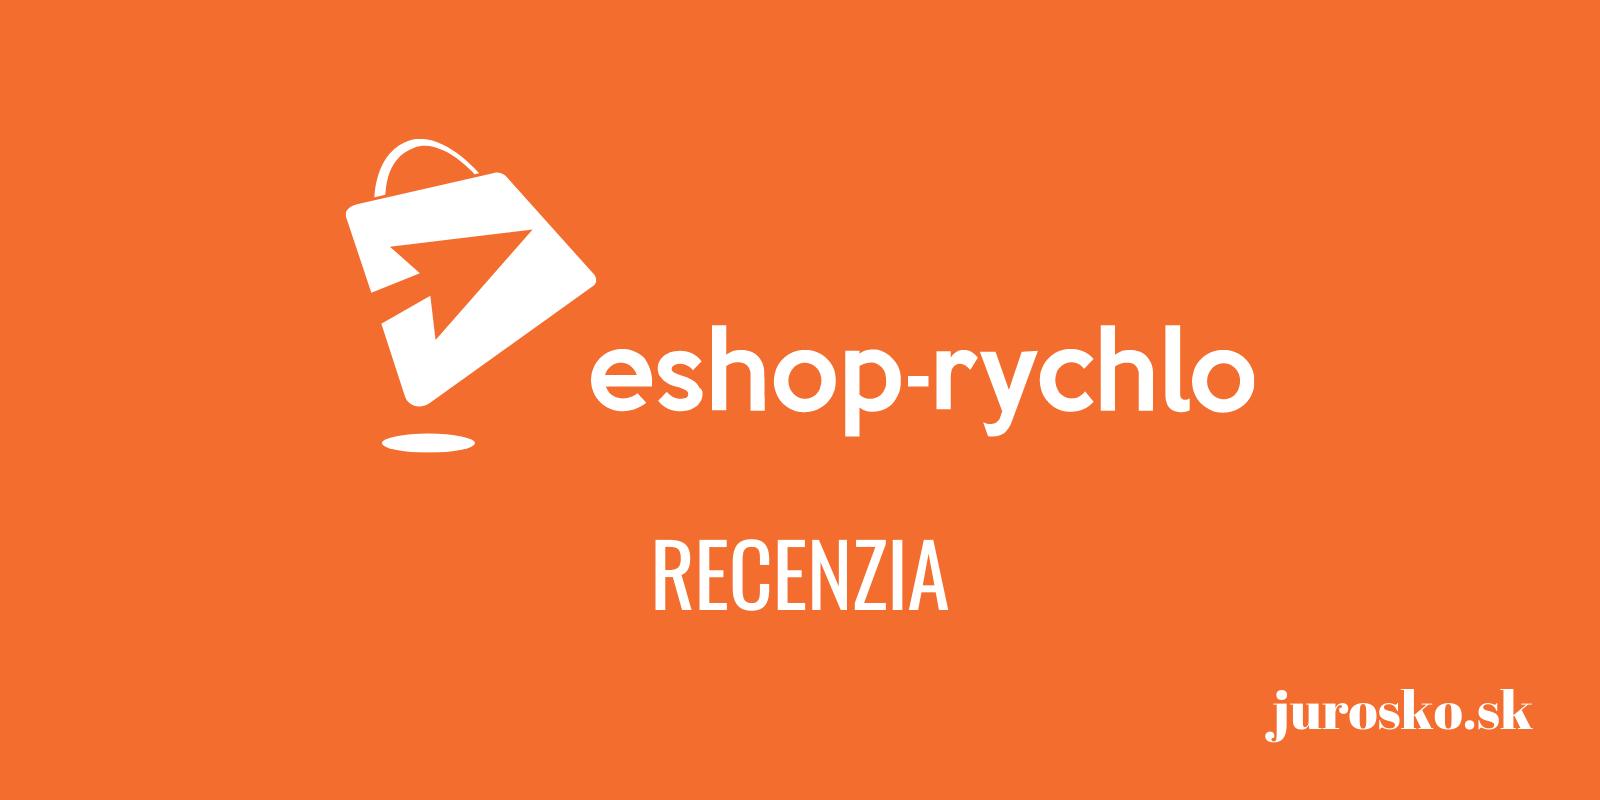 Eshop-rychlo - recenzia